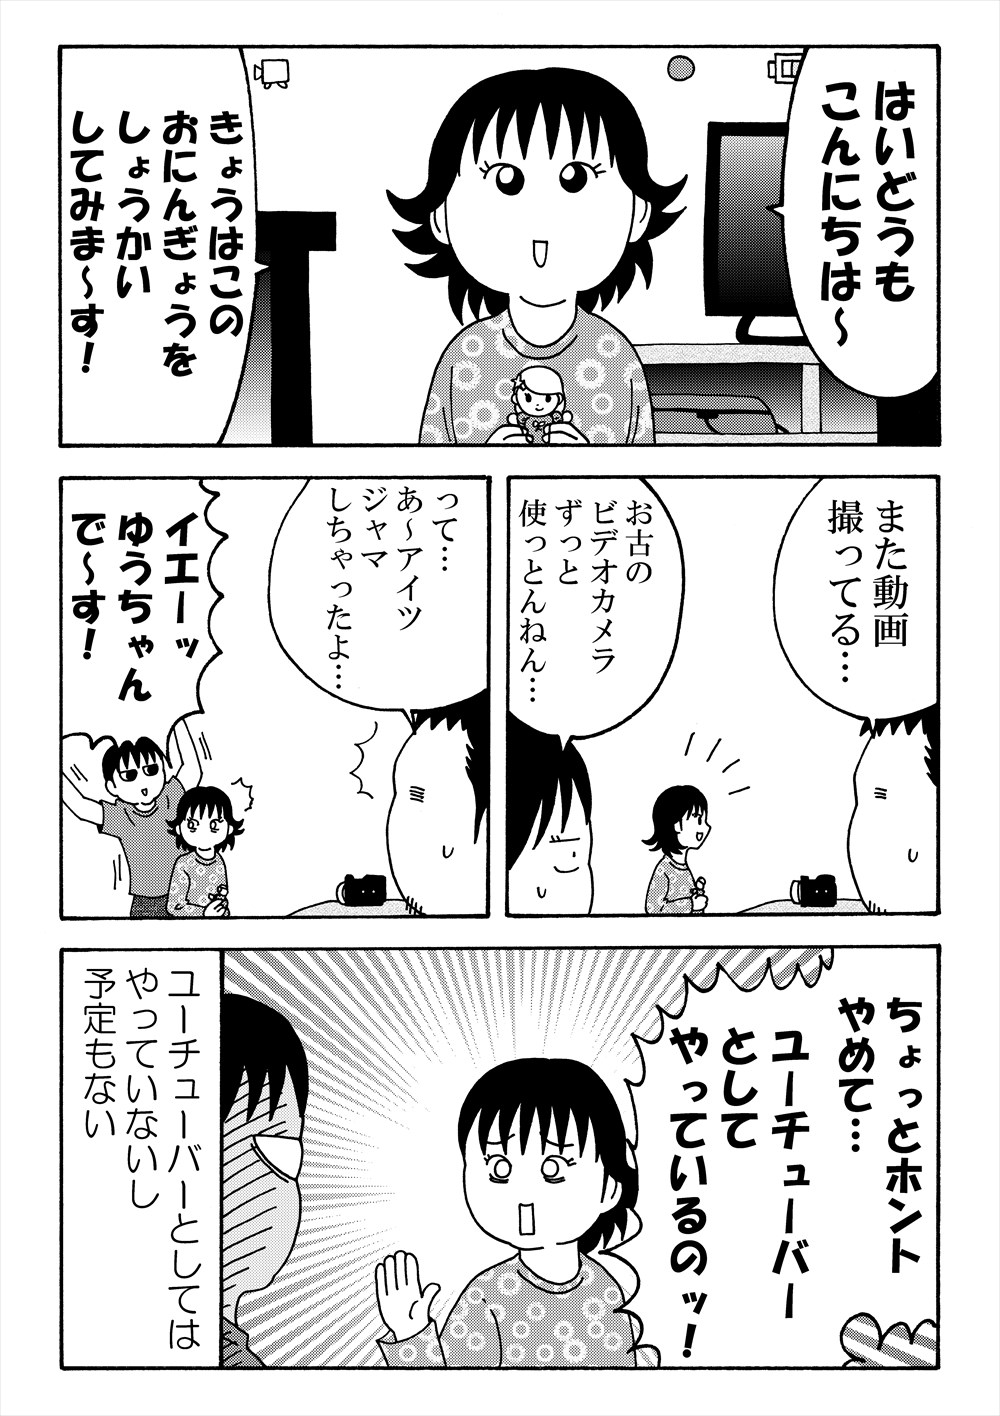 yokoyamake15kai_R